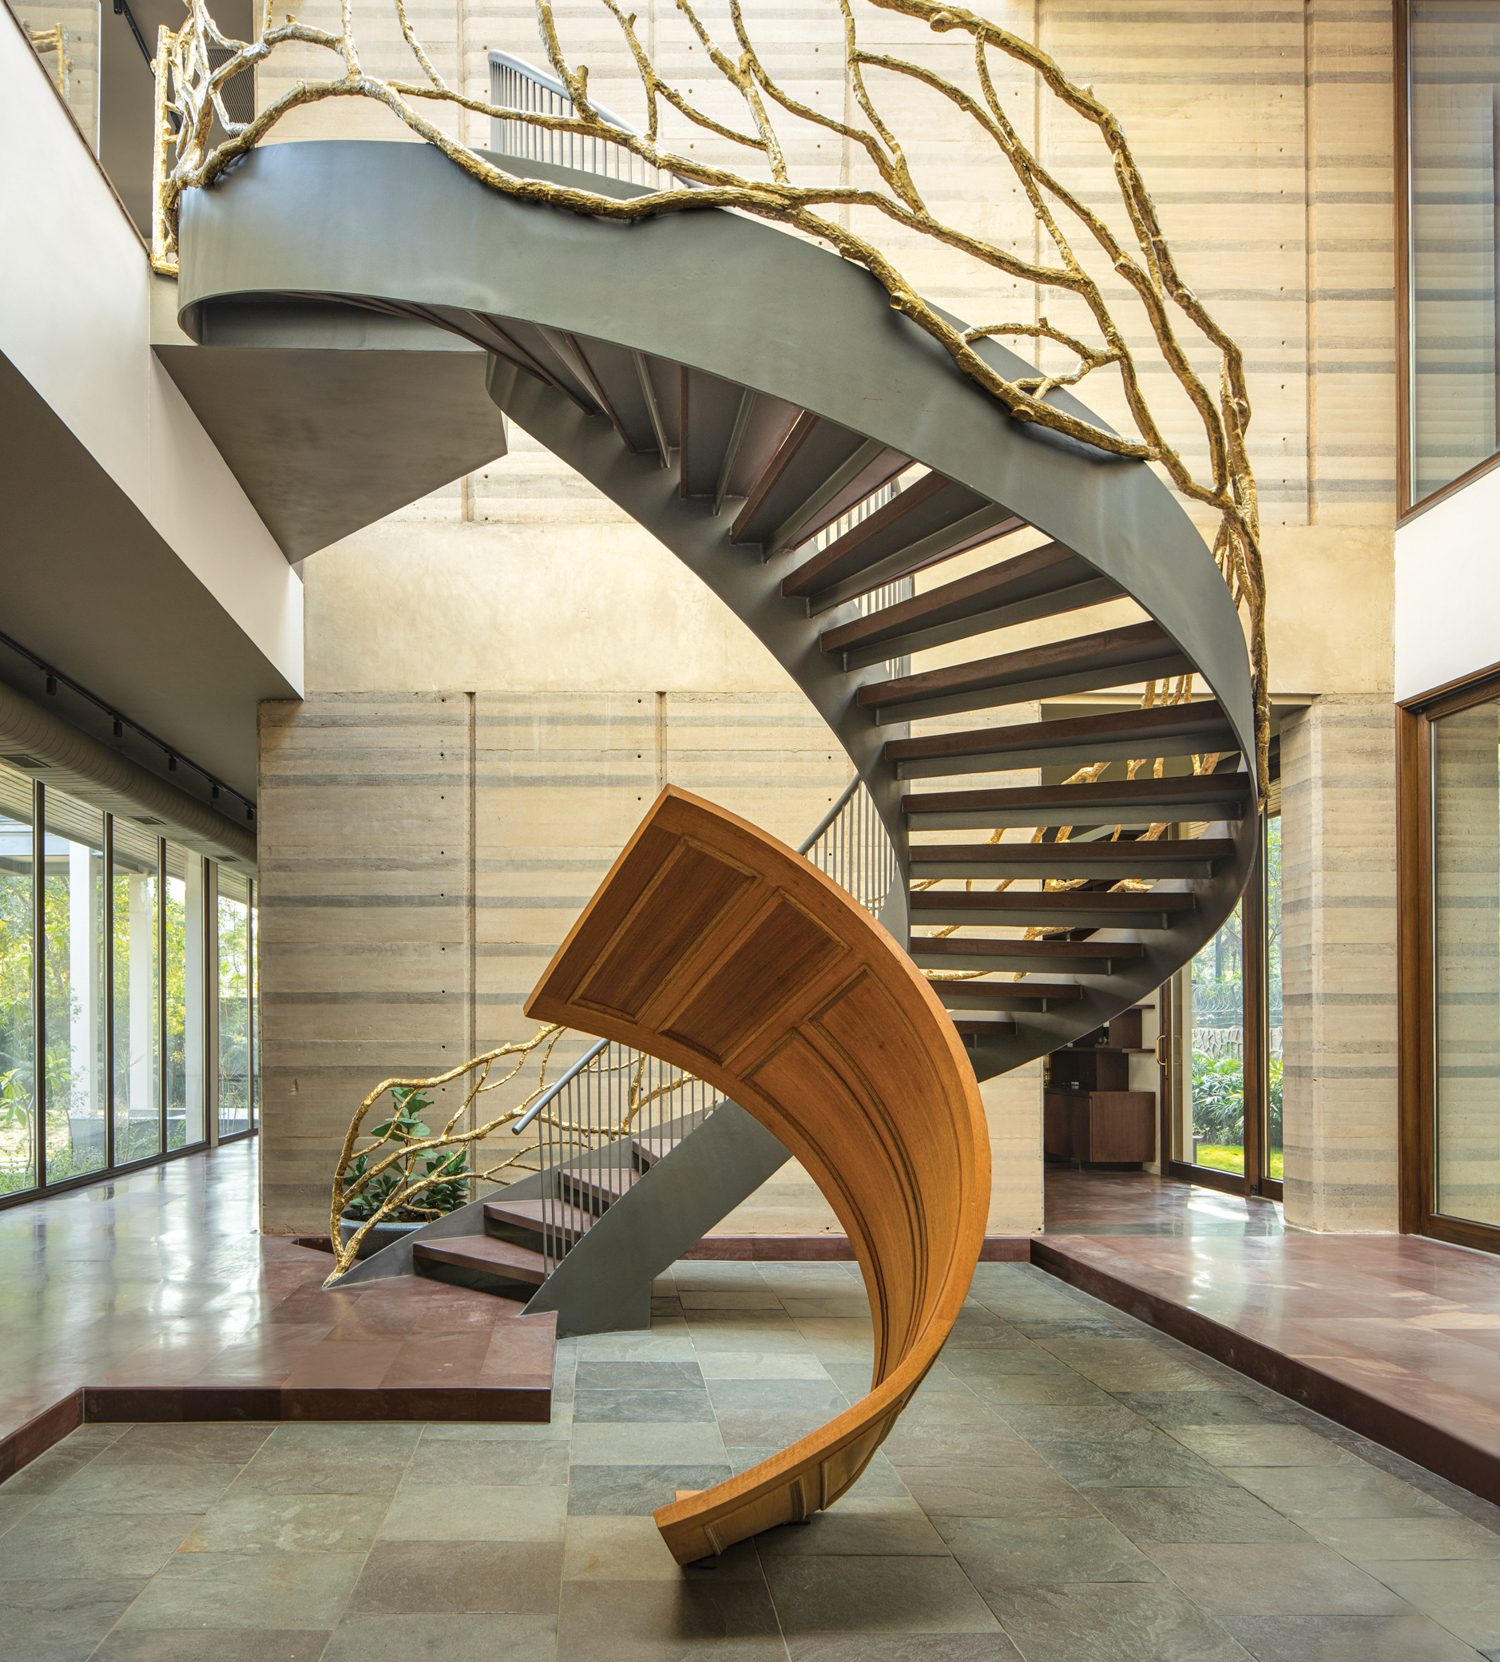 New Delhi residence by Studio Lotus